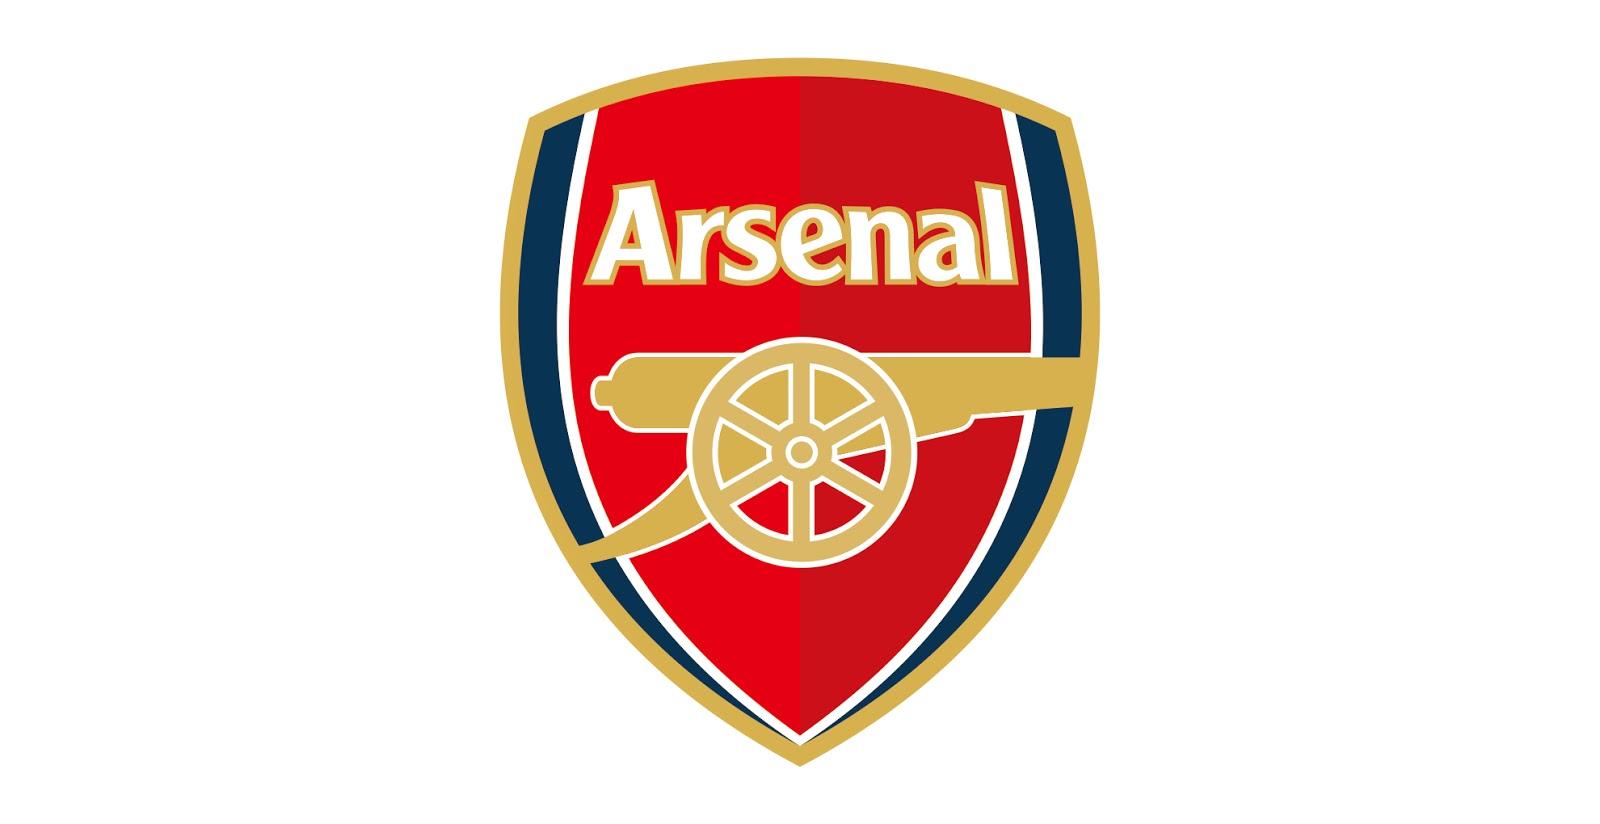 soccer team logos arsenal fc logo png